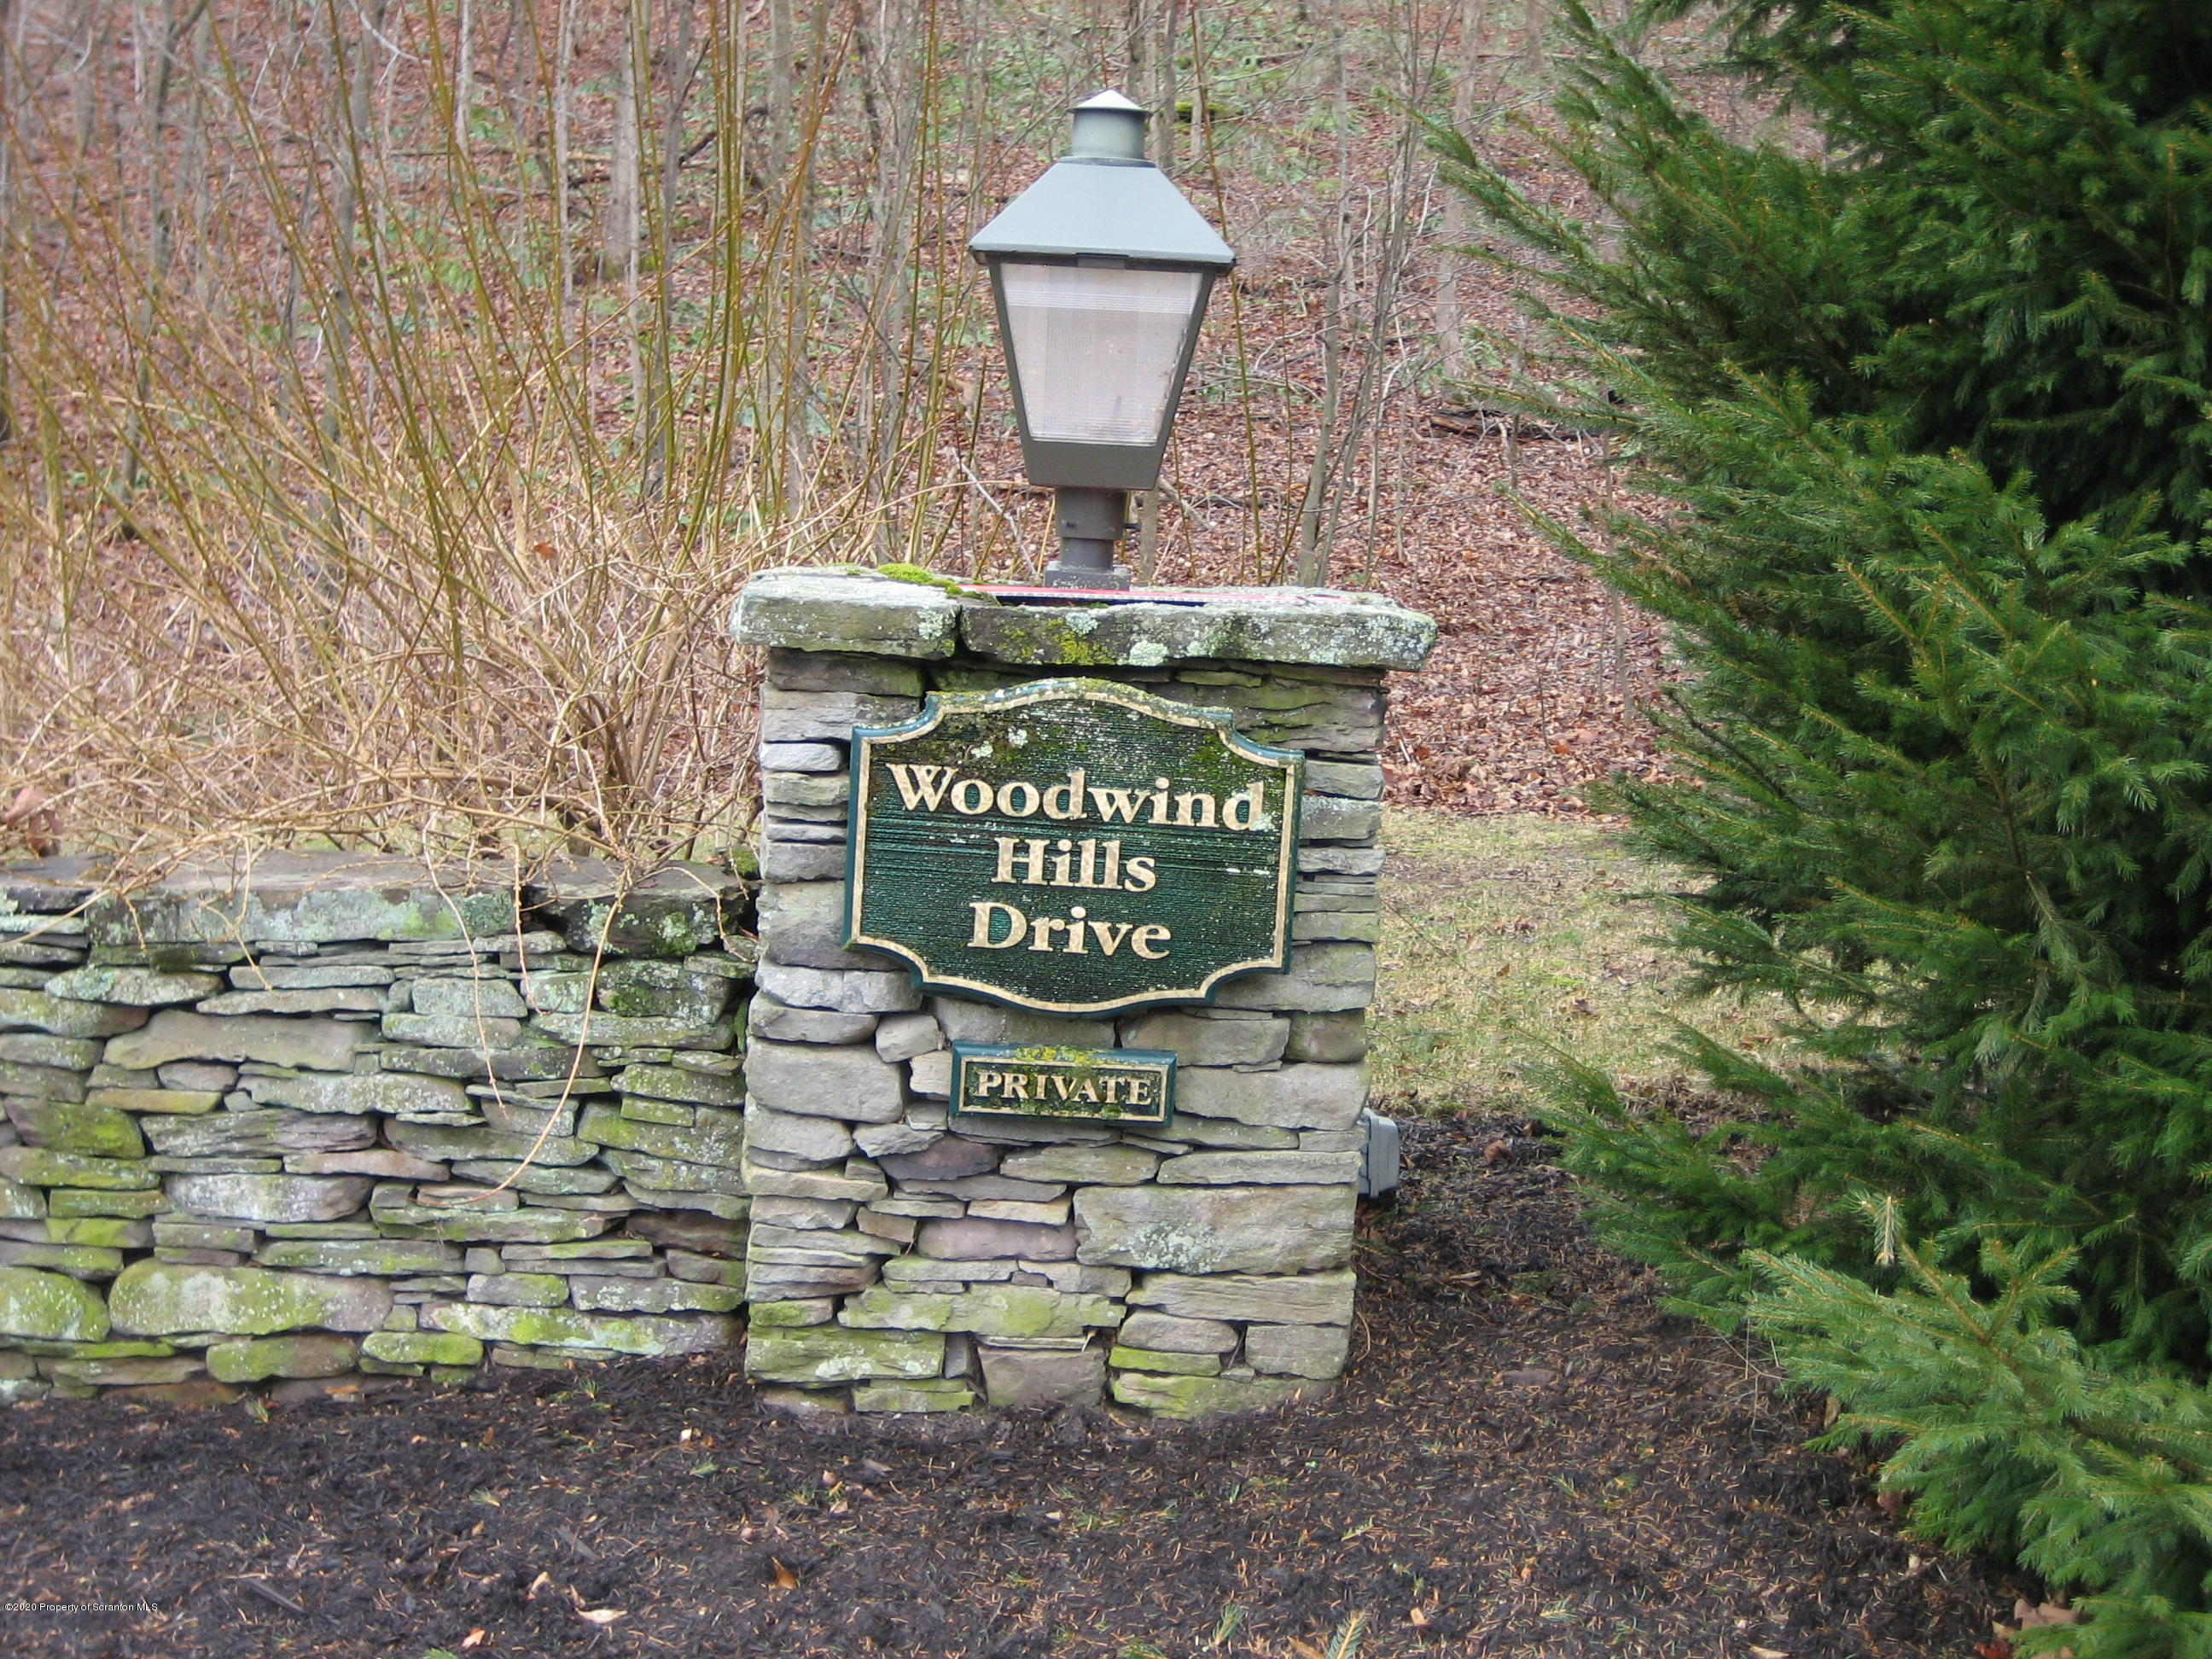 1014 Woodwind Hills Dr, Dalton, Pennsylvania 18414, ,Land,For Sale,Woodwind Hills,20-828